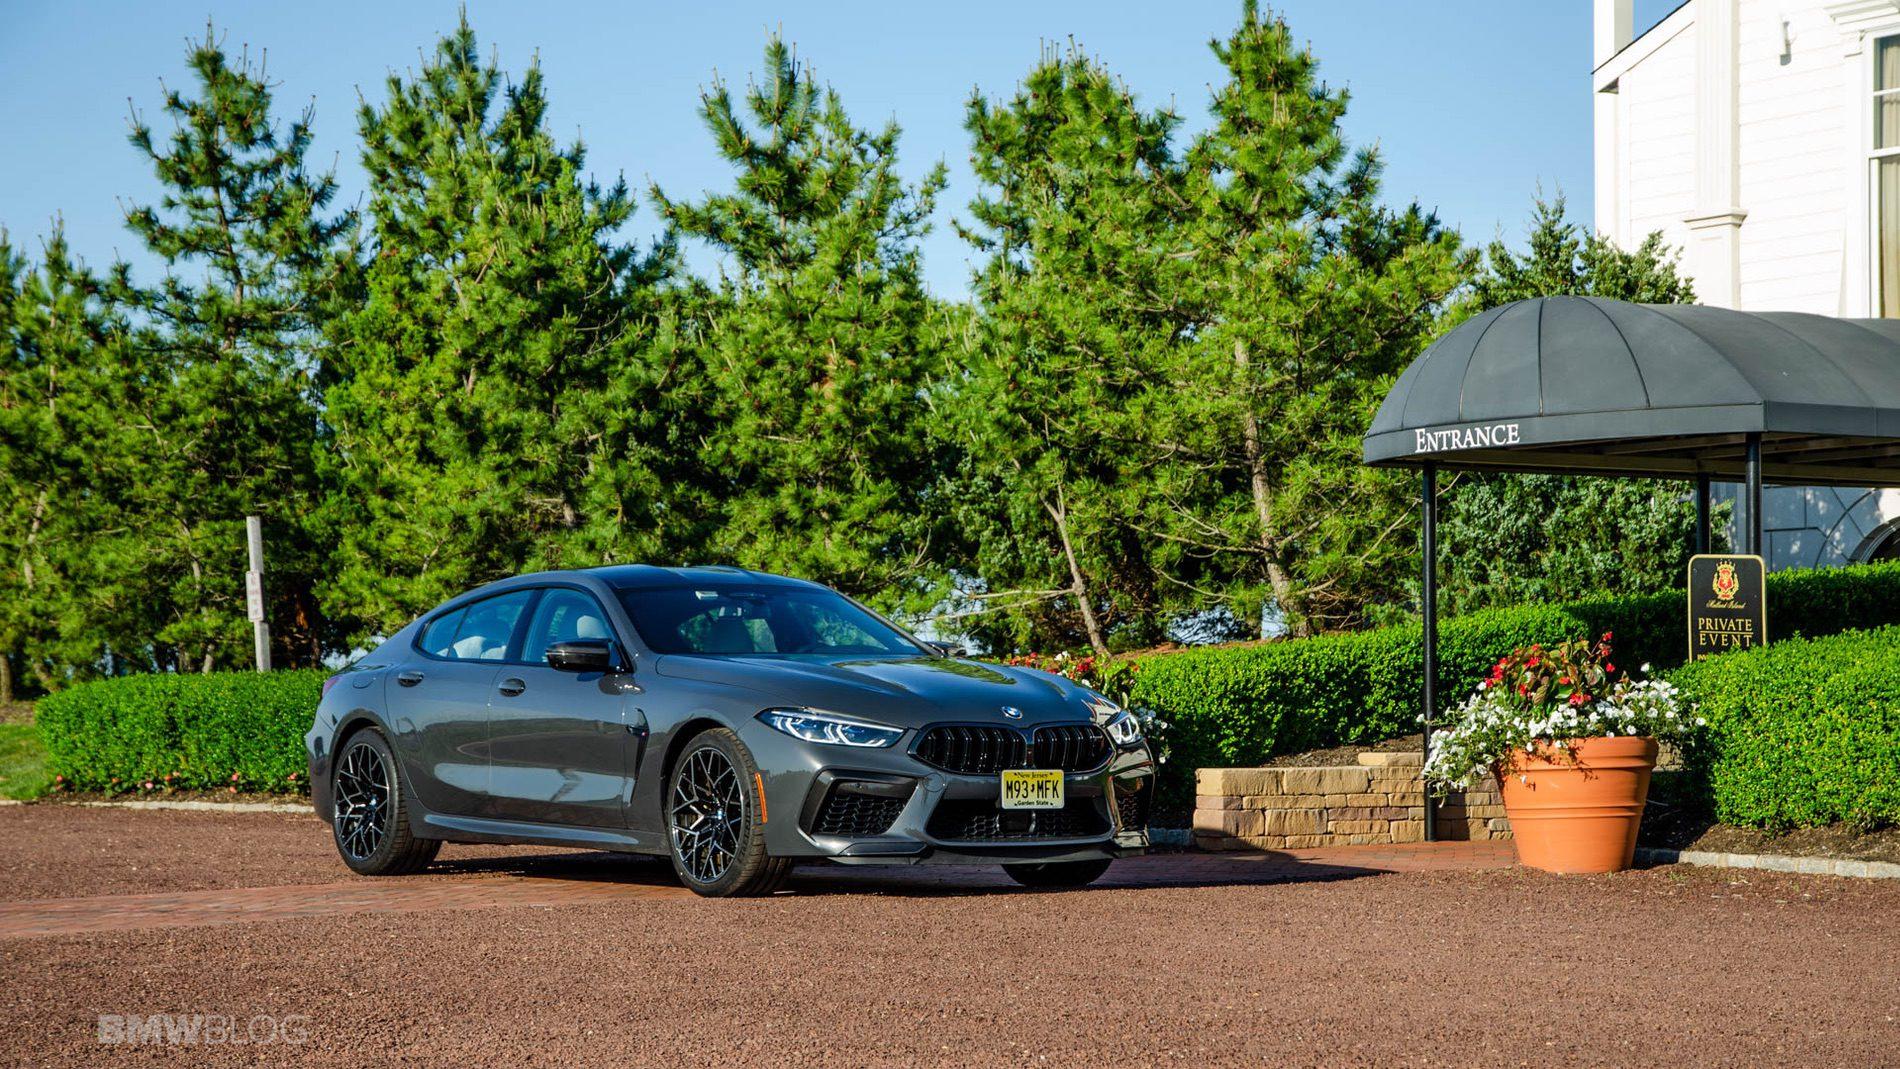 2021 BMW M8 Gran Coupe test drive 04